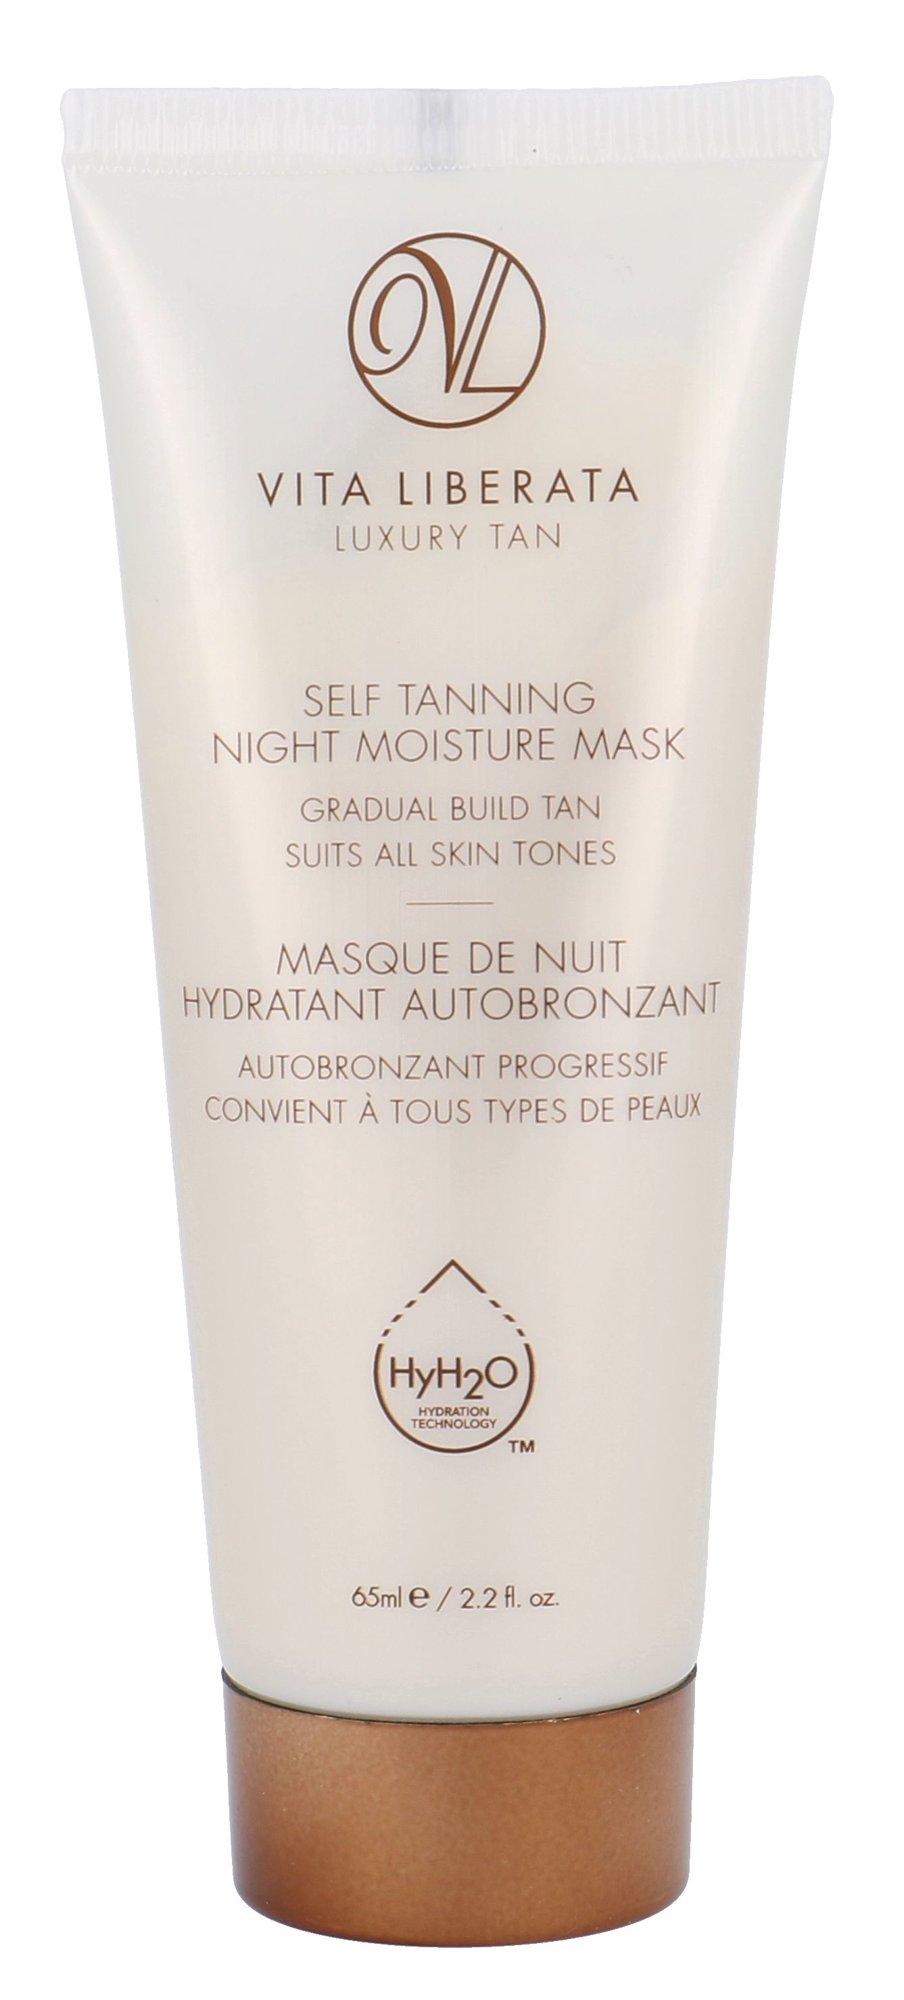 Vita Liberata Self Tanning Cosmetic 65ml  Night Moisture Mask